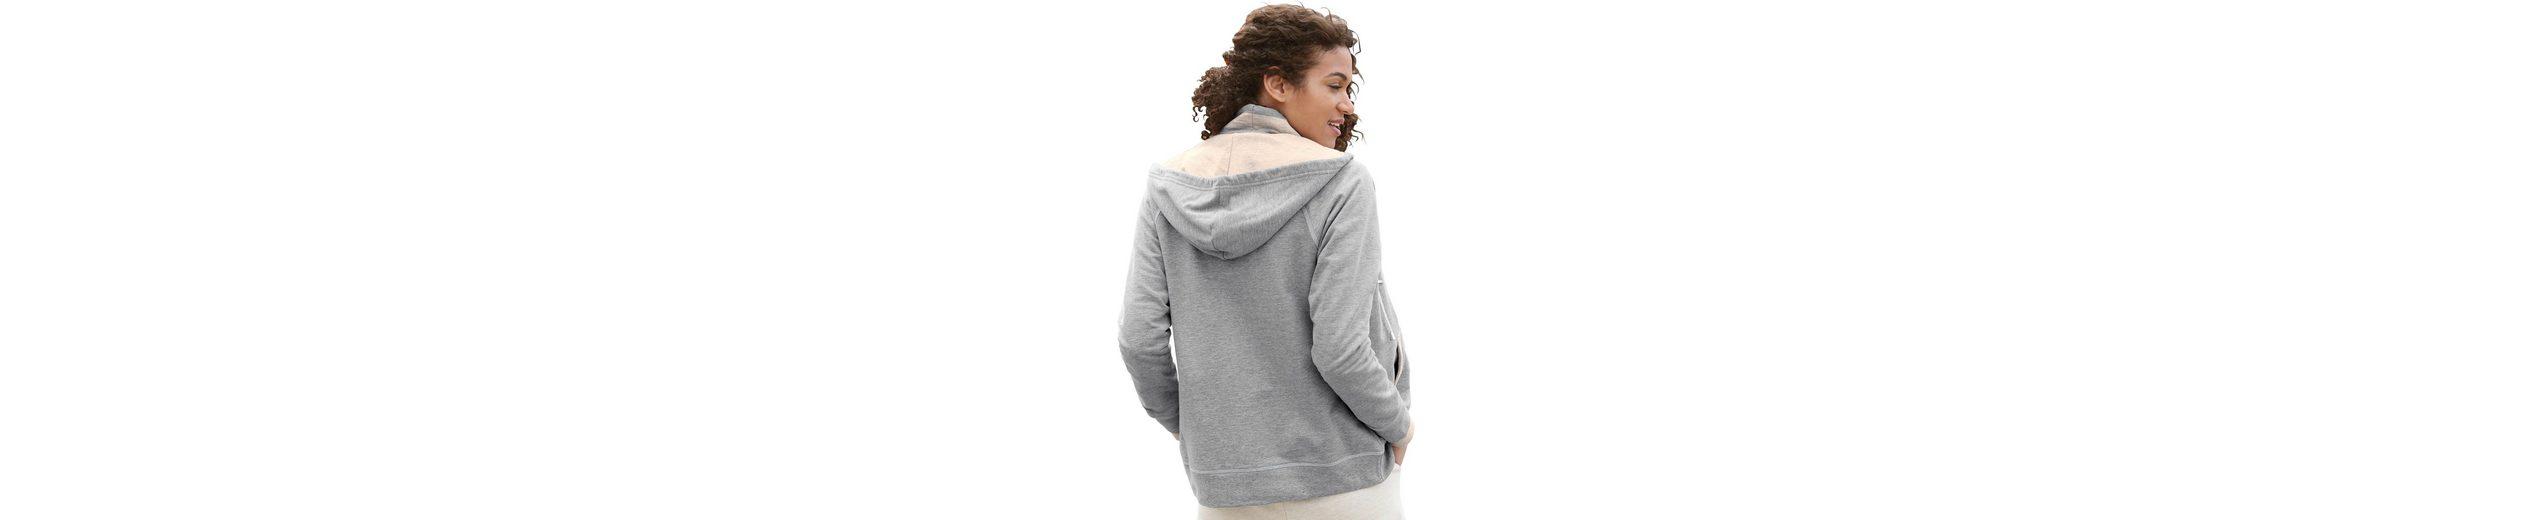 Collection L. Shirtjacke mit Kapuze Niedriger Preis uovxrpJDUI